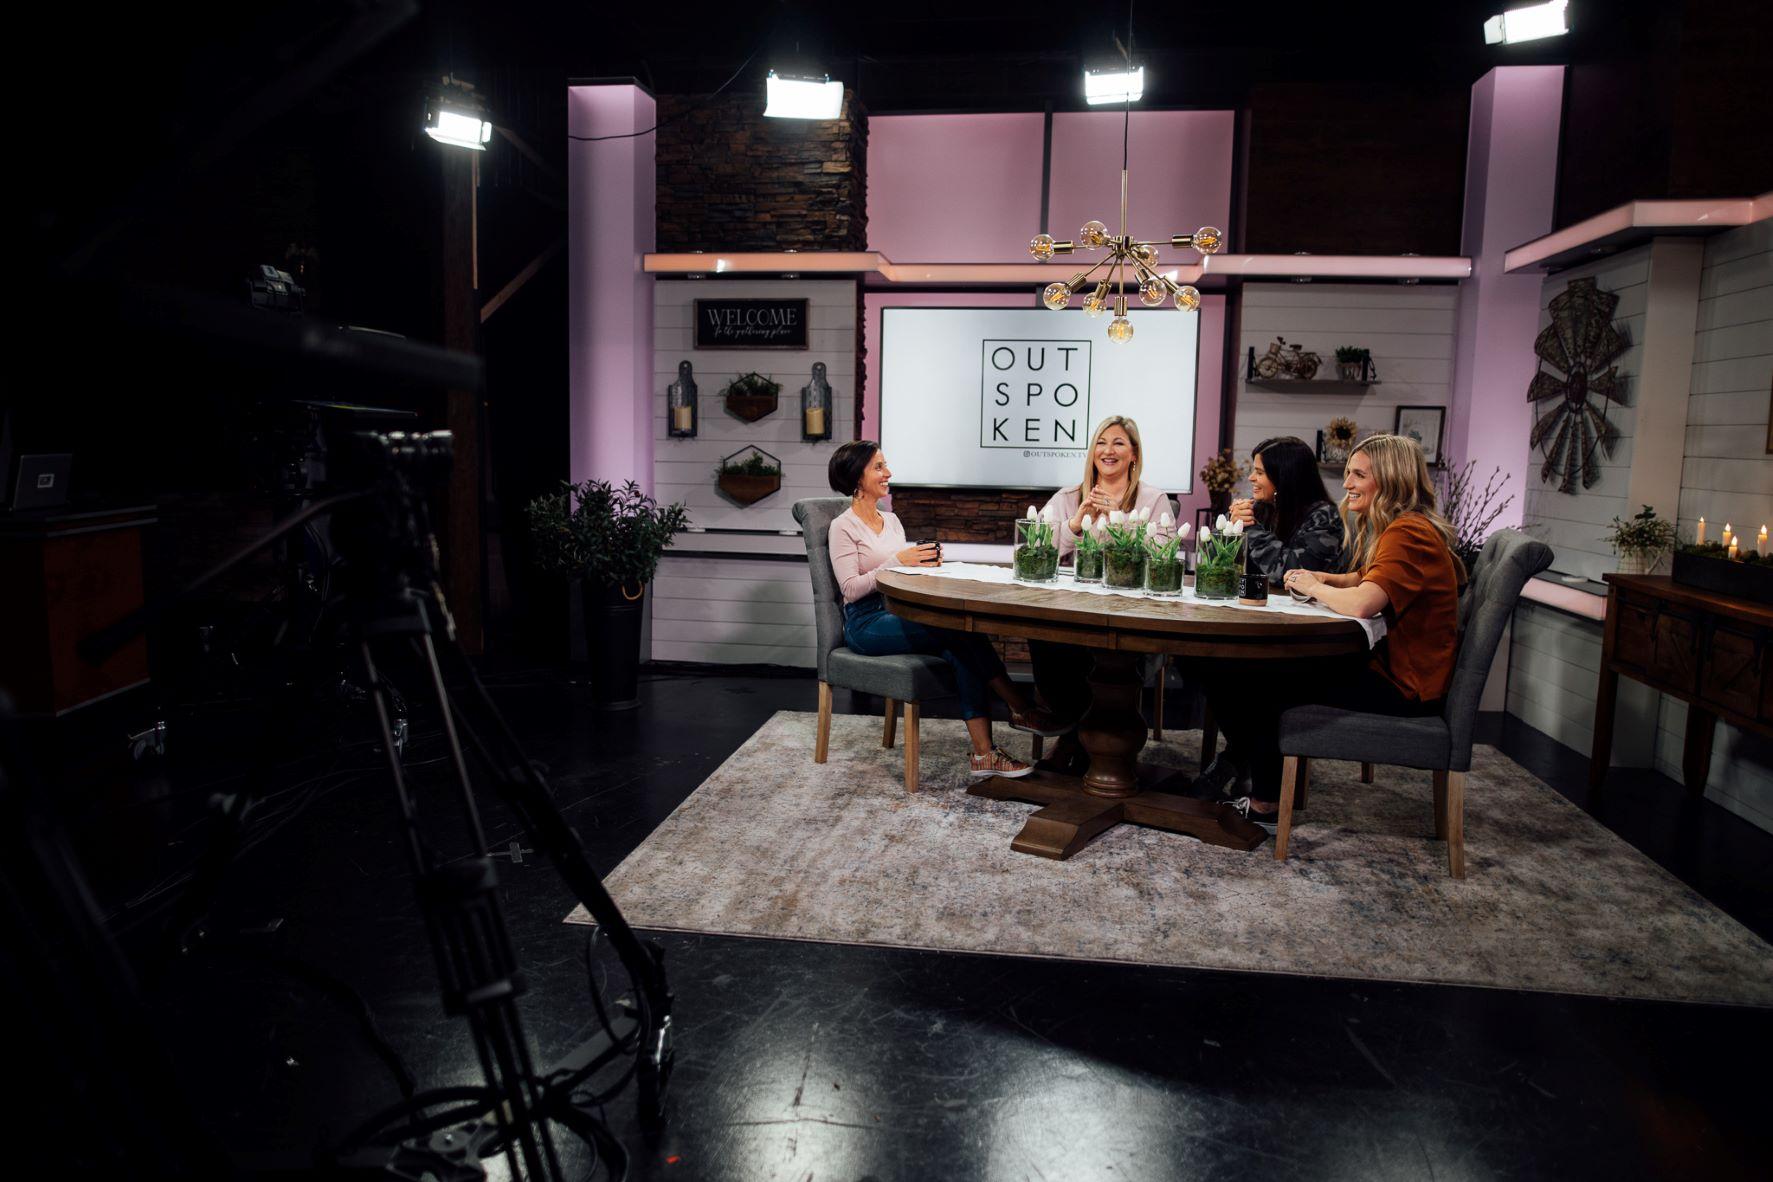 female talk shows